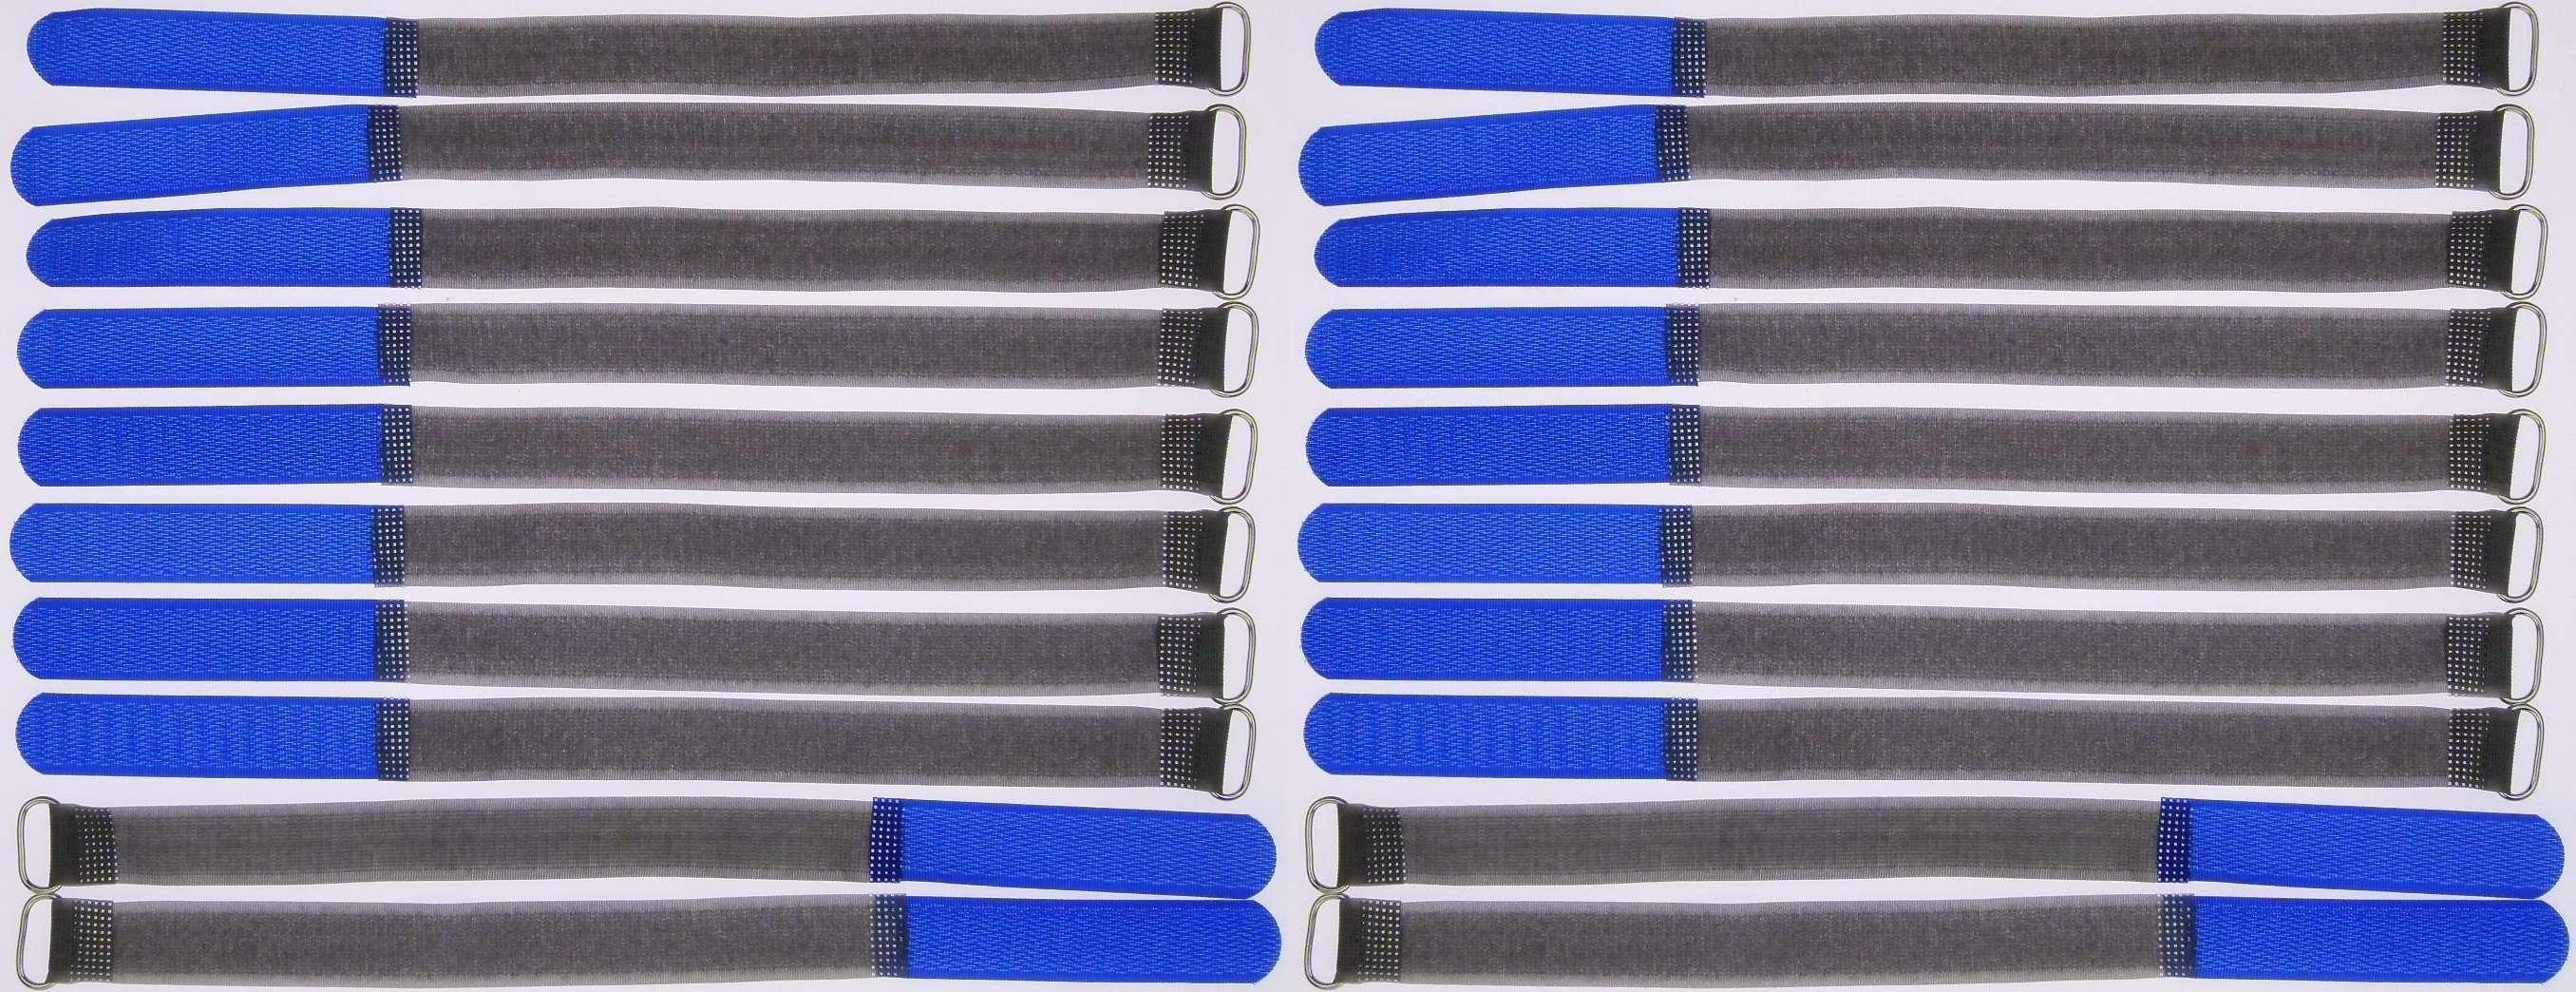 20x Klettbänder Kabelklett 300 x 20mm rot Kabel Klett Band Kabelbinder Klettband